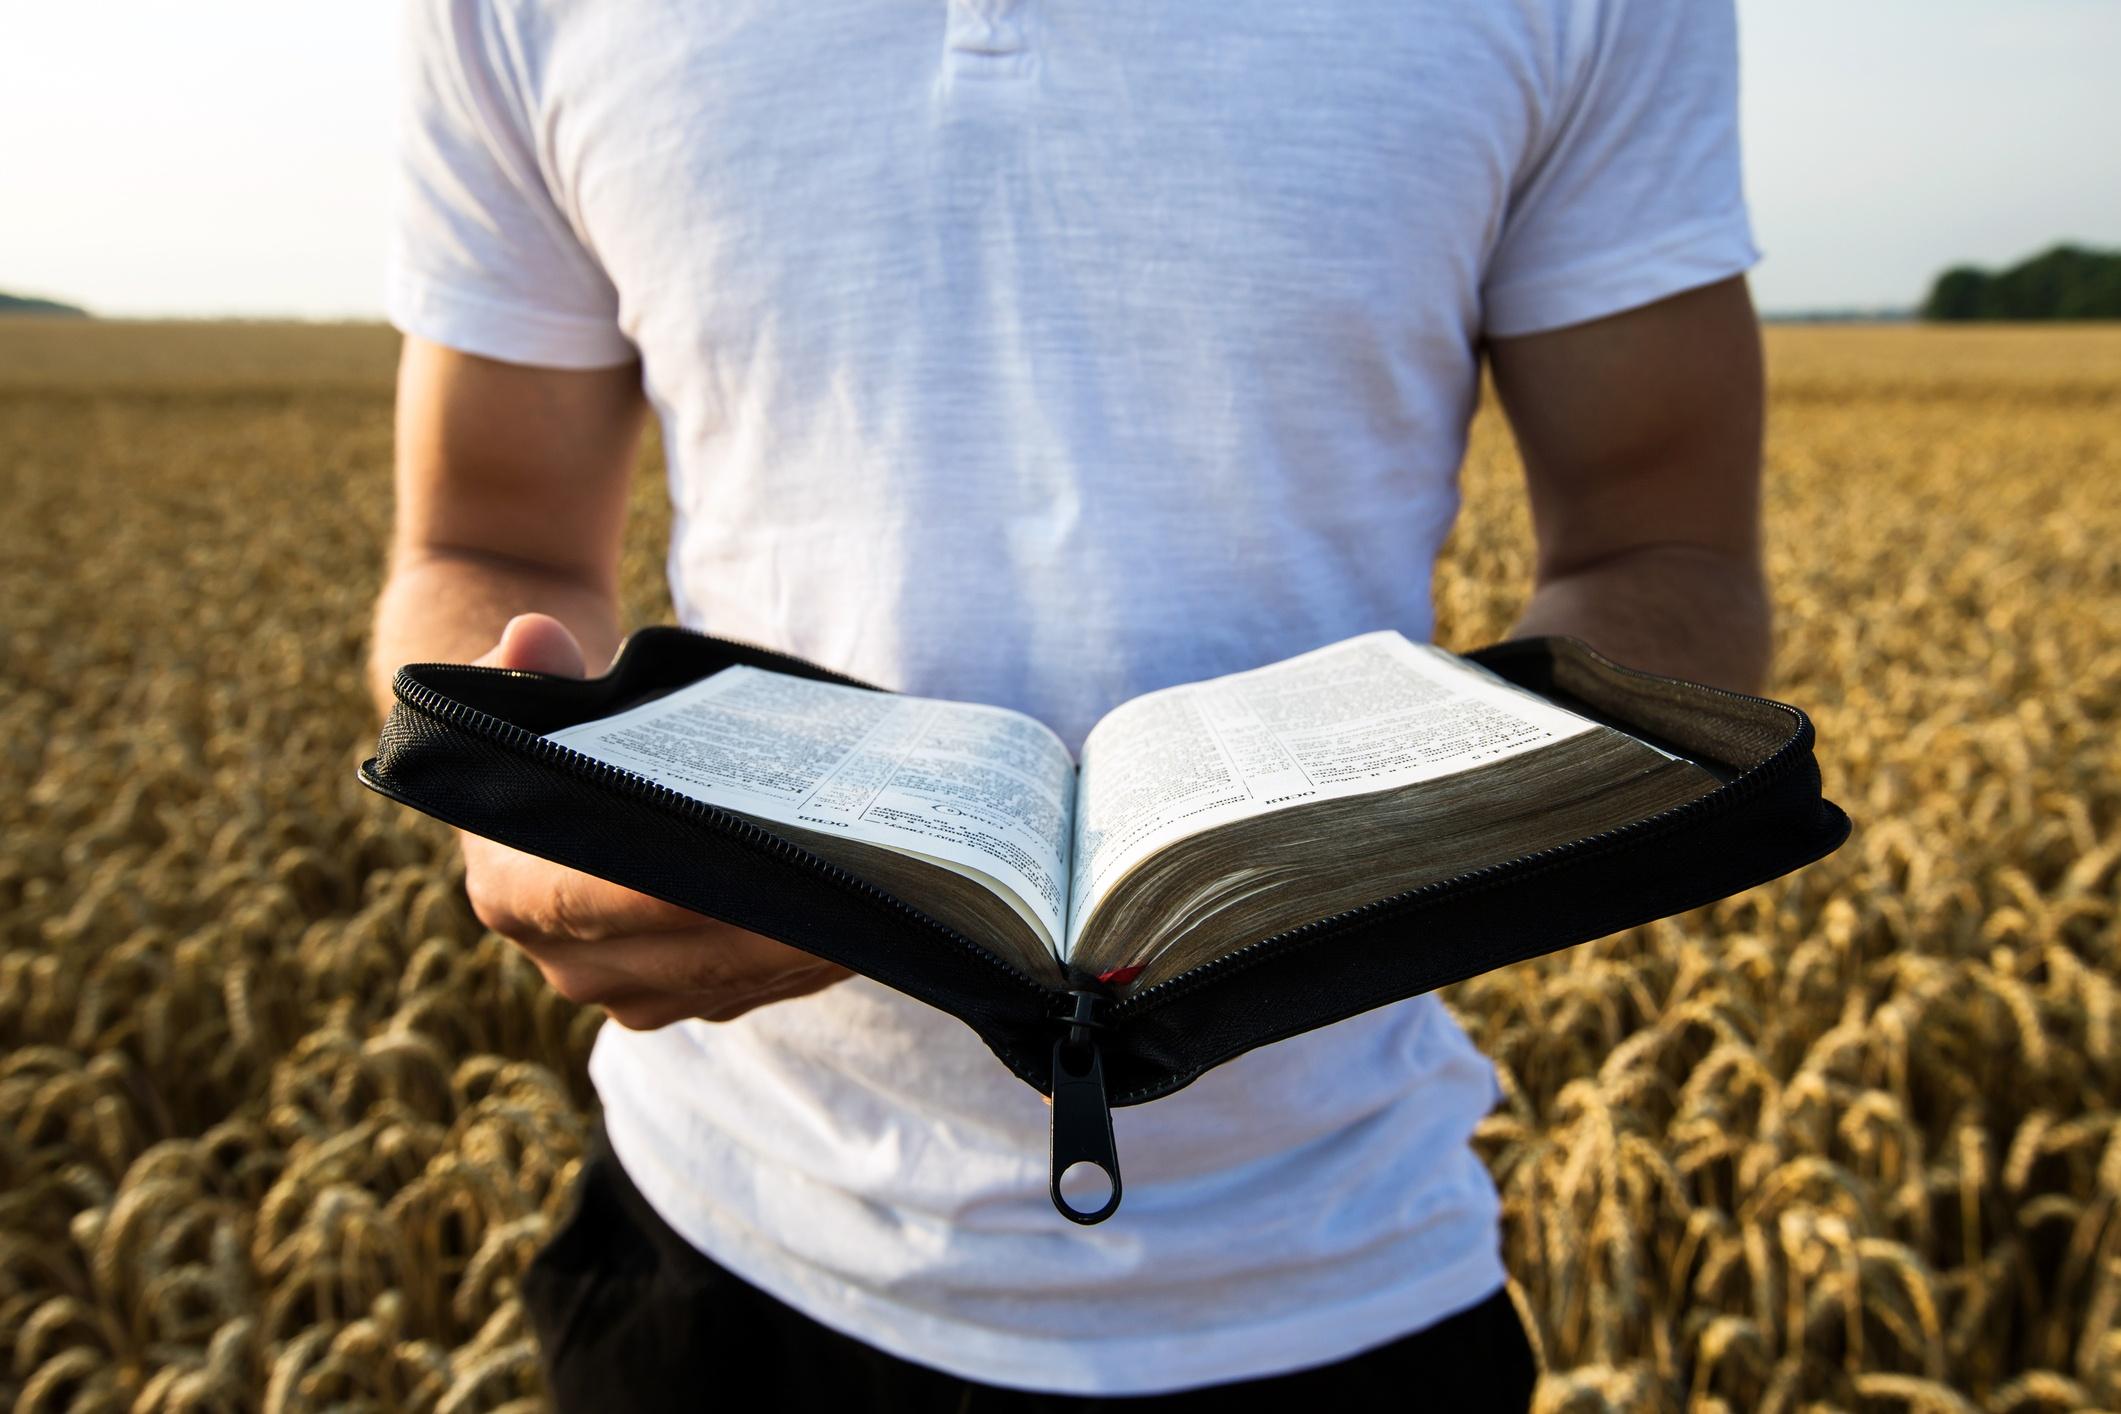 Pator_church_bible_preaching_preacher_christian.jpg